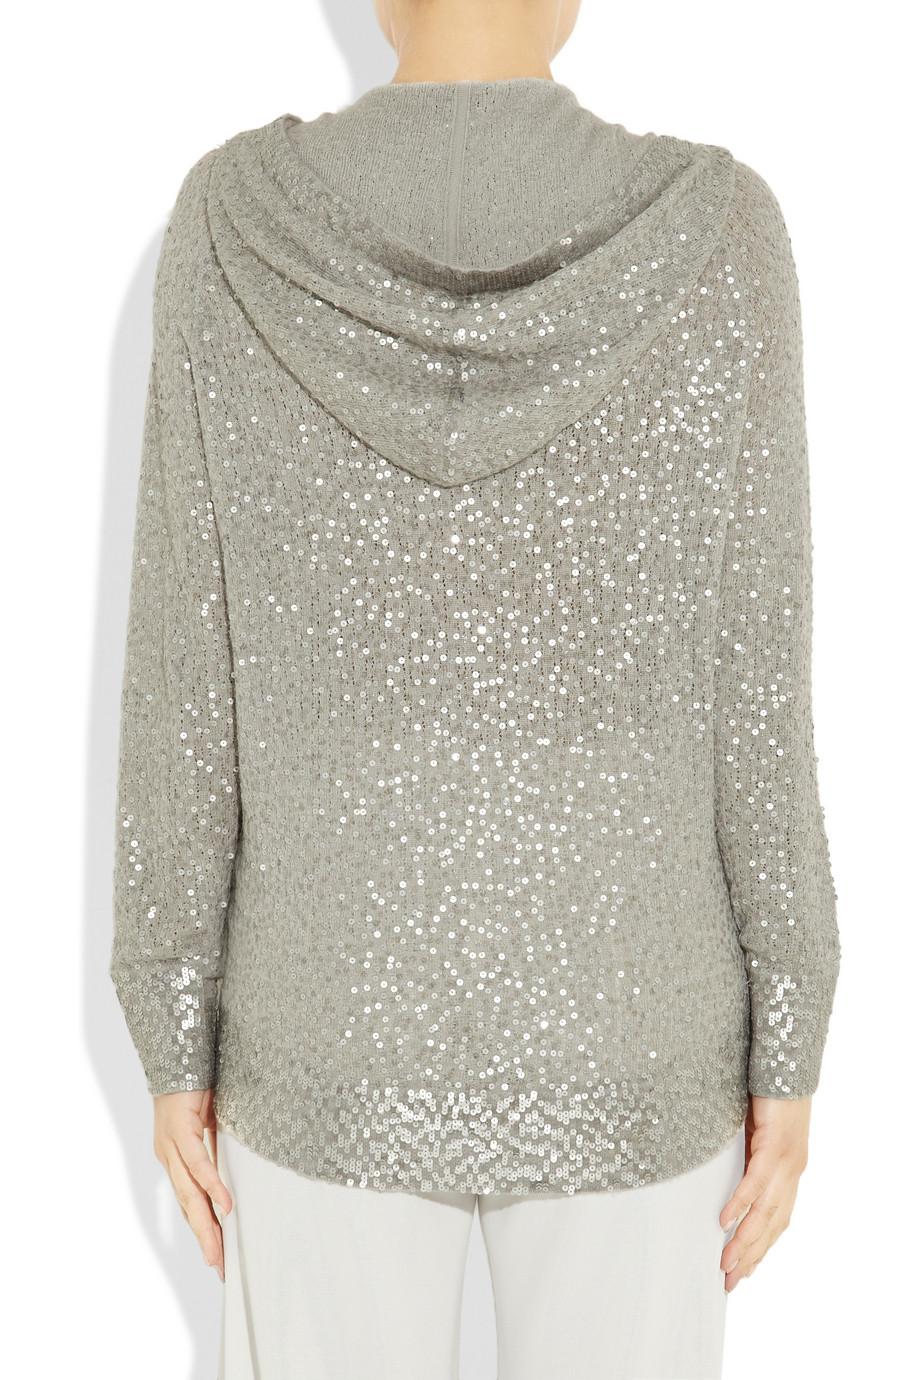 donna karan sequined cashmere and silk blend sweater in. Black Bedroom Furniture Sets. Home Design Ideas